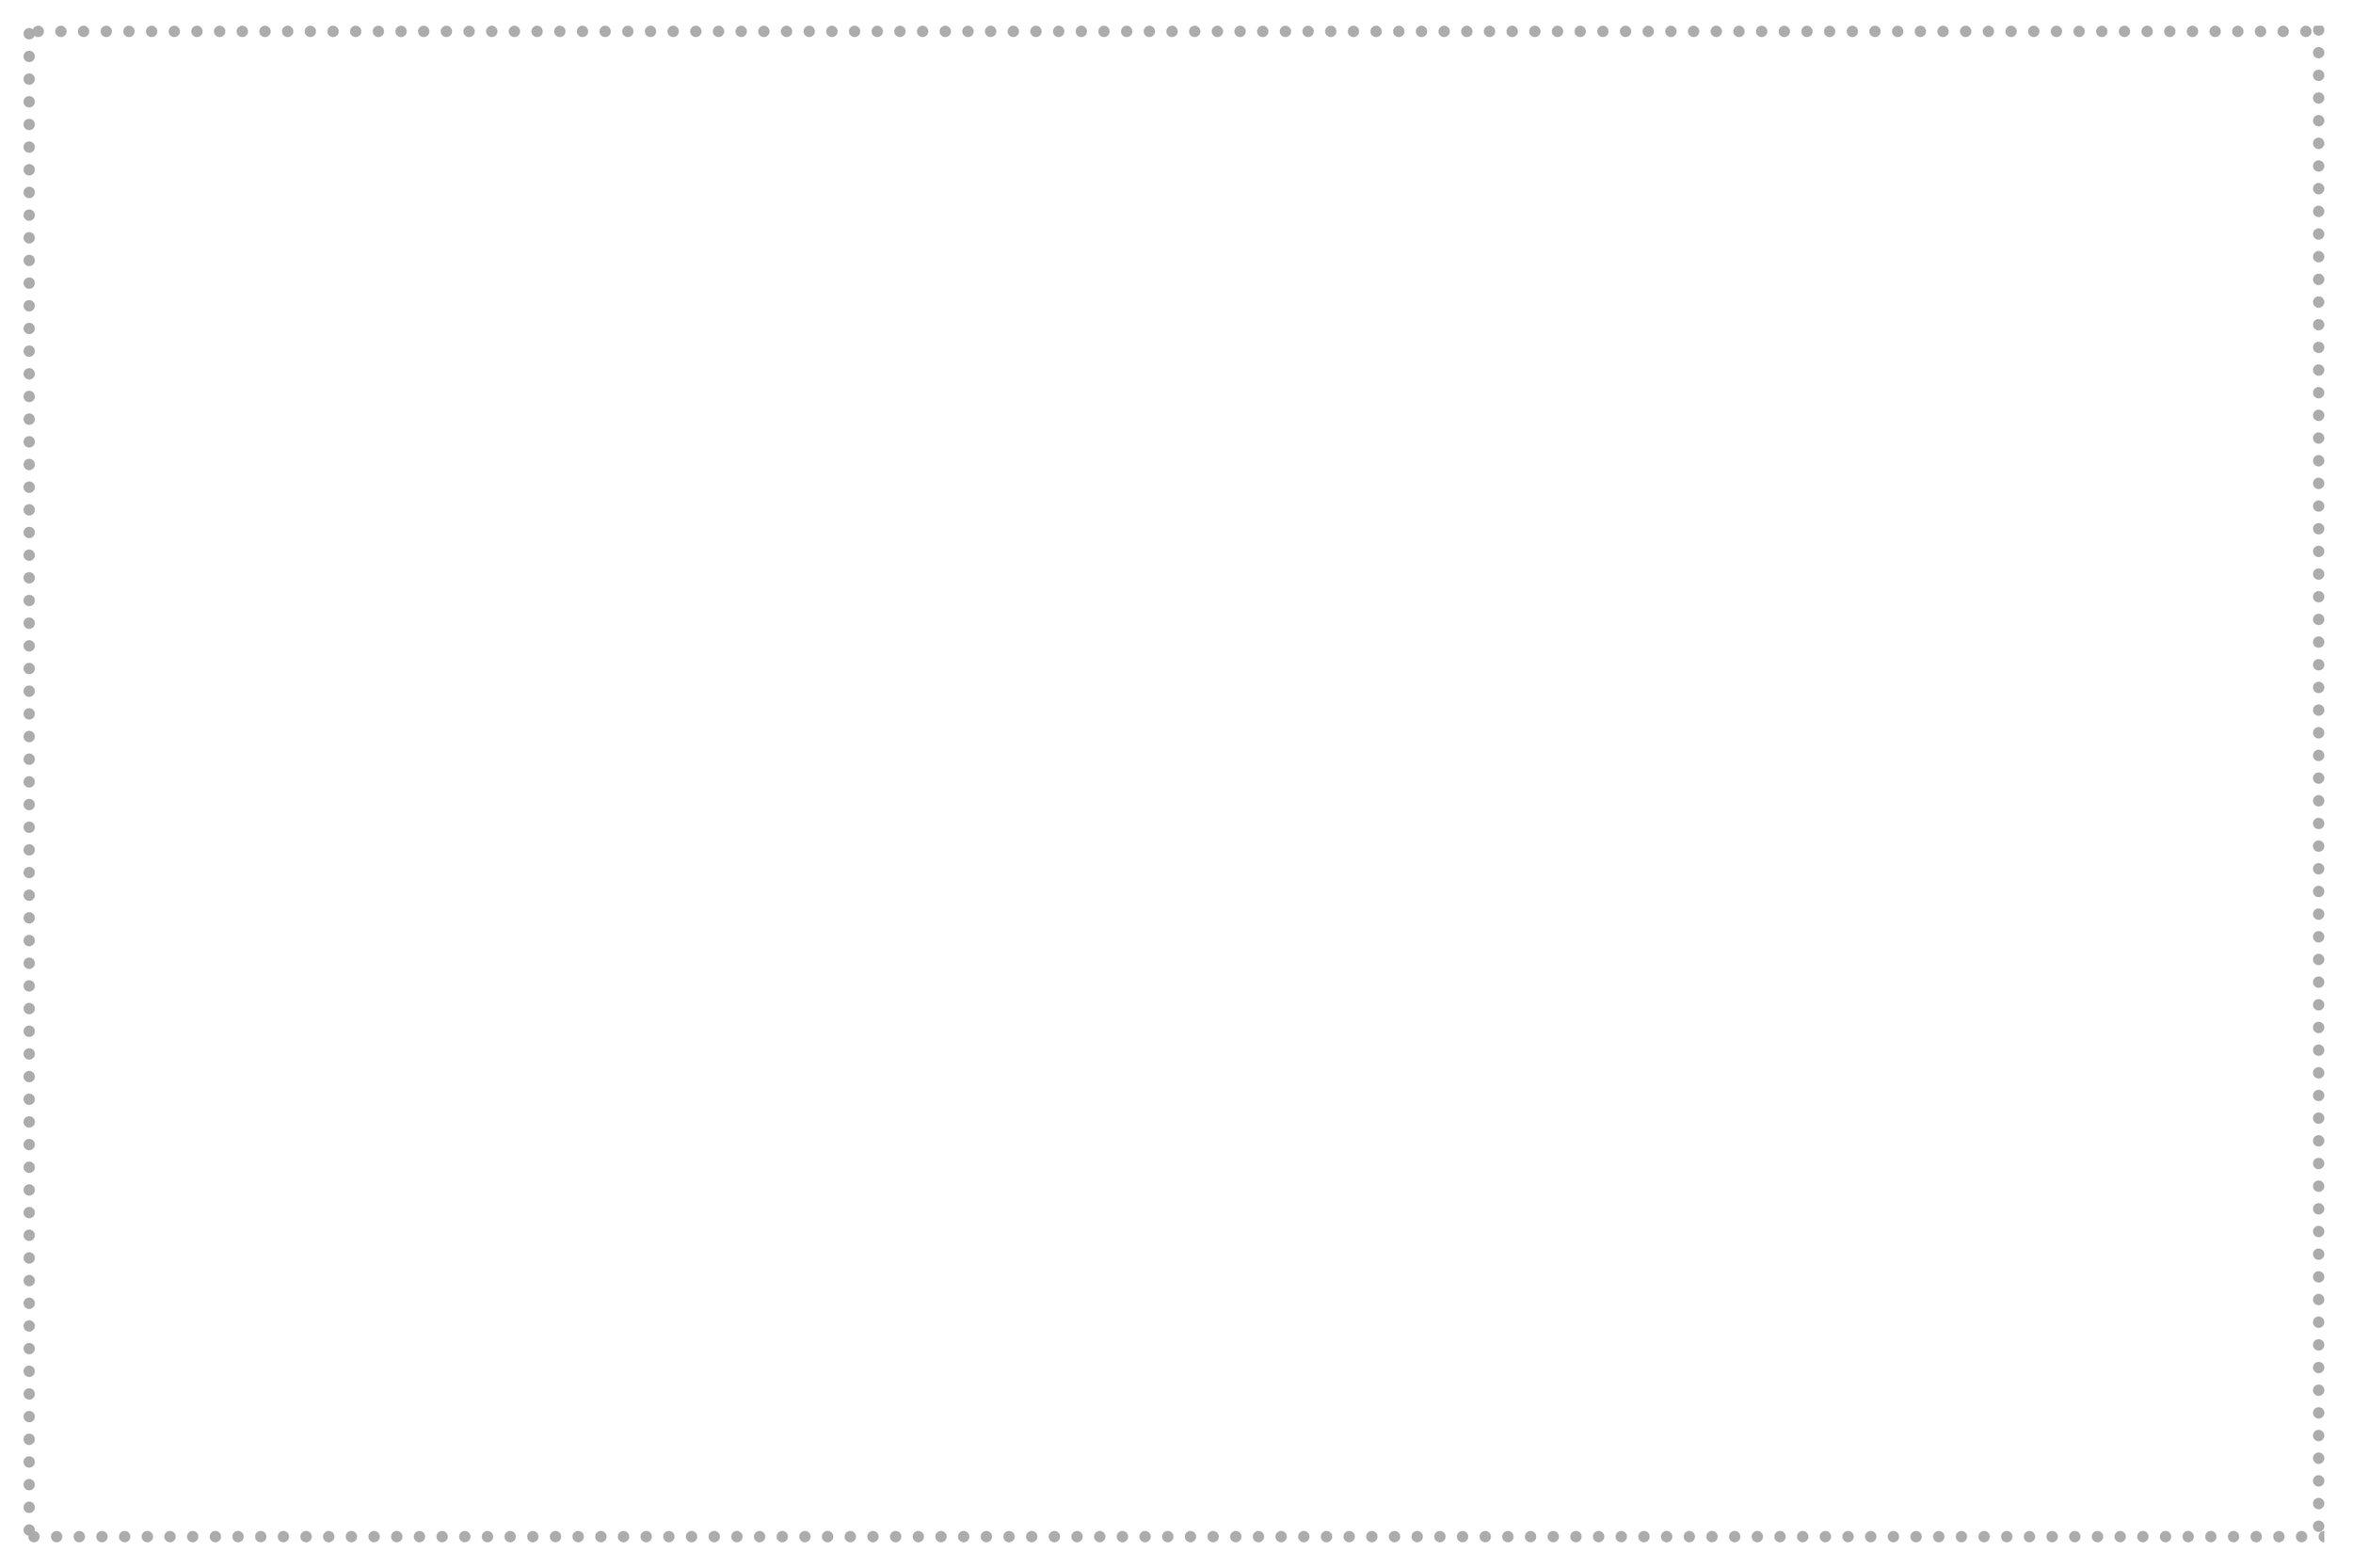 "Package 20 - £560 (Mon-Fri), £590 (Weekend & Bank holidays) - - 20 digital files- 1 unframed 11"" x 14"" print"